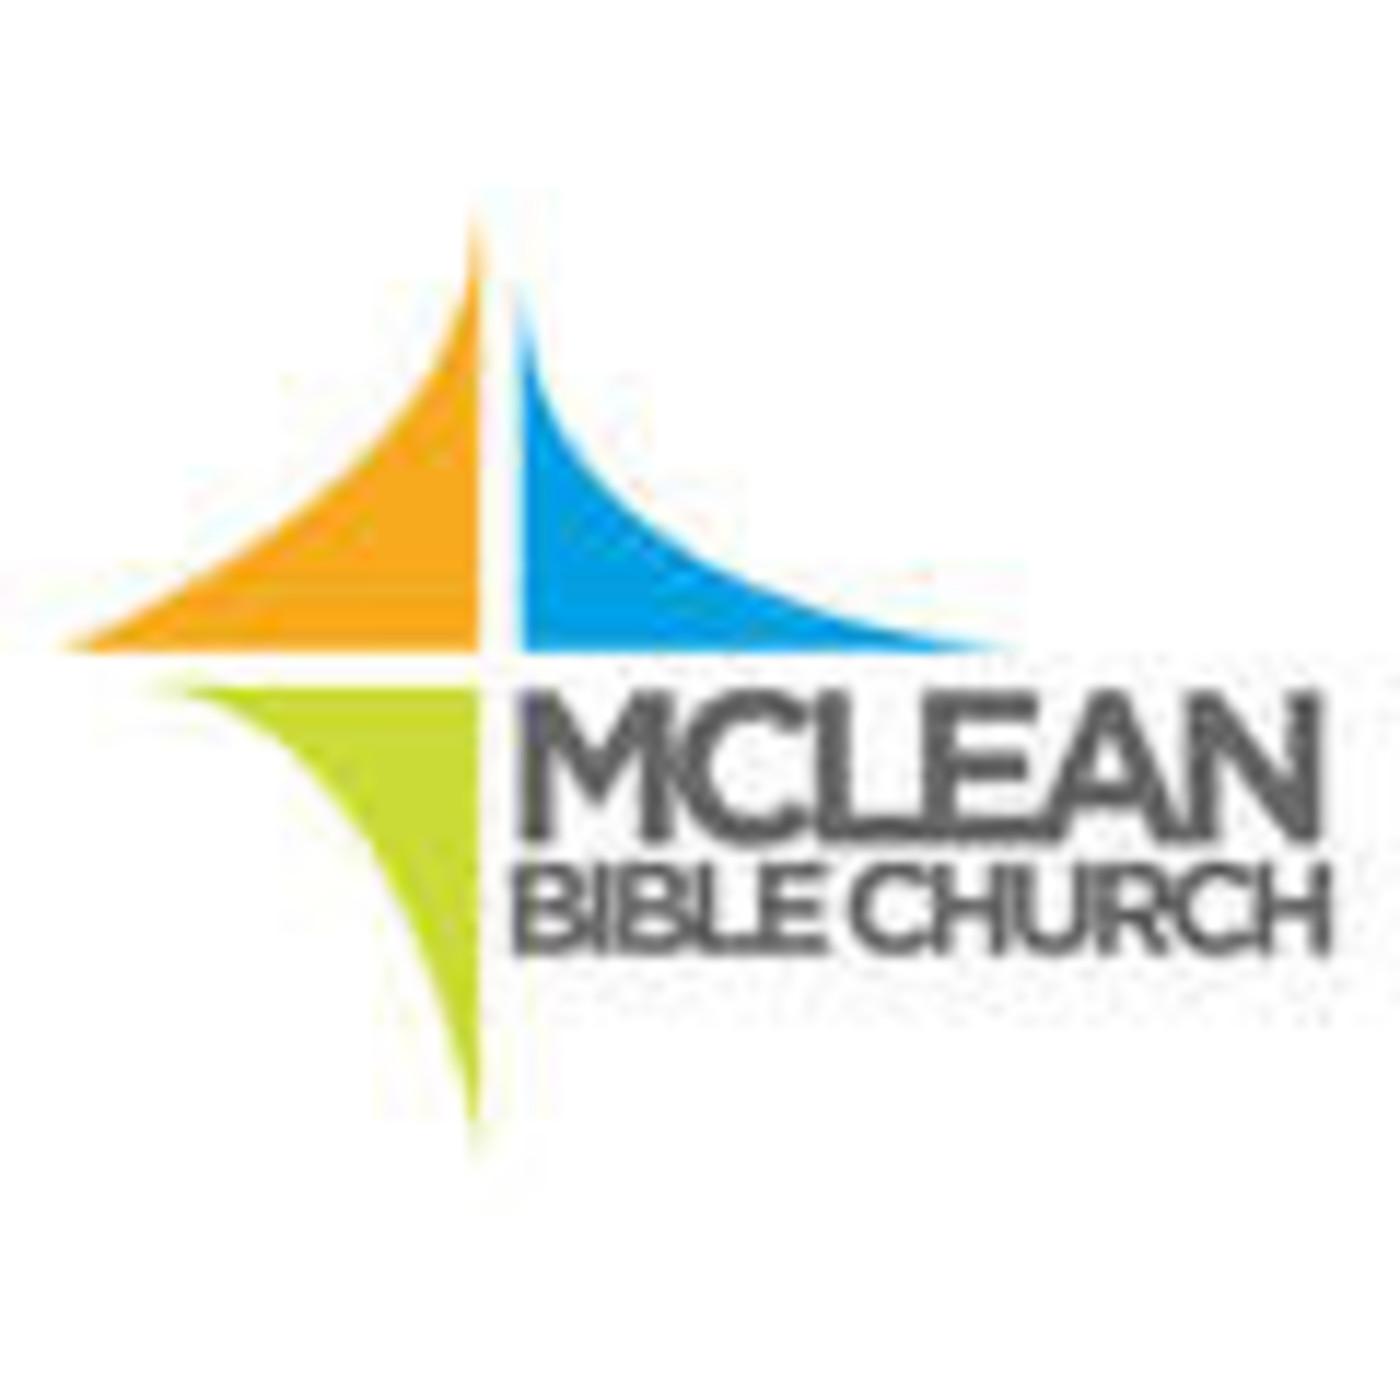 McLean Bible Church